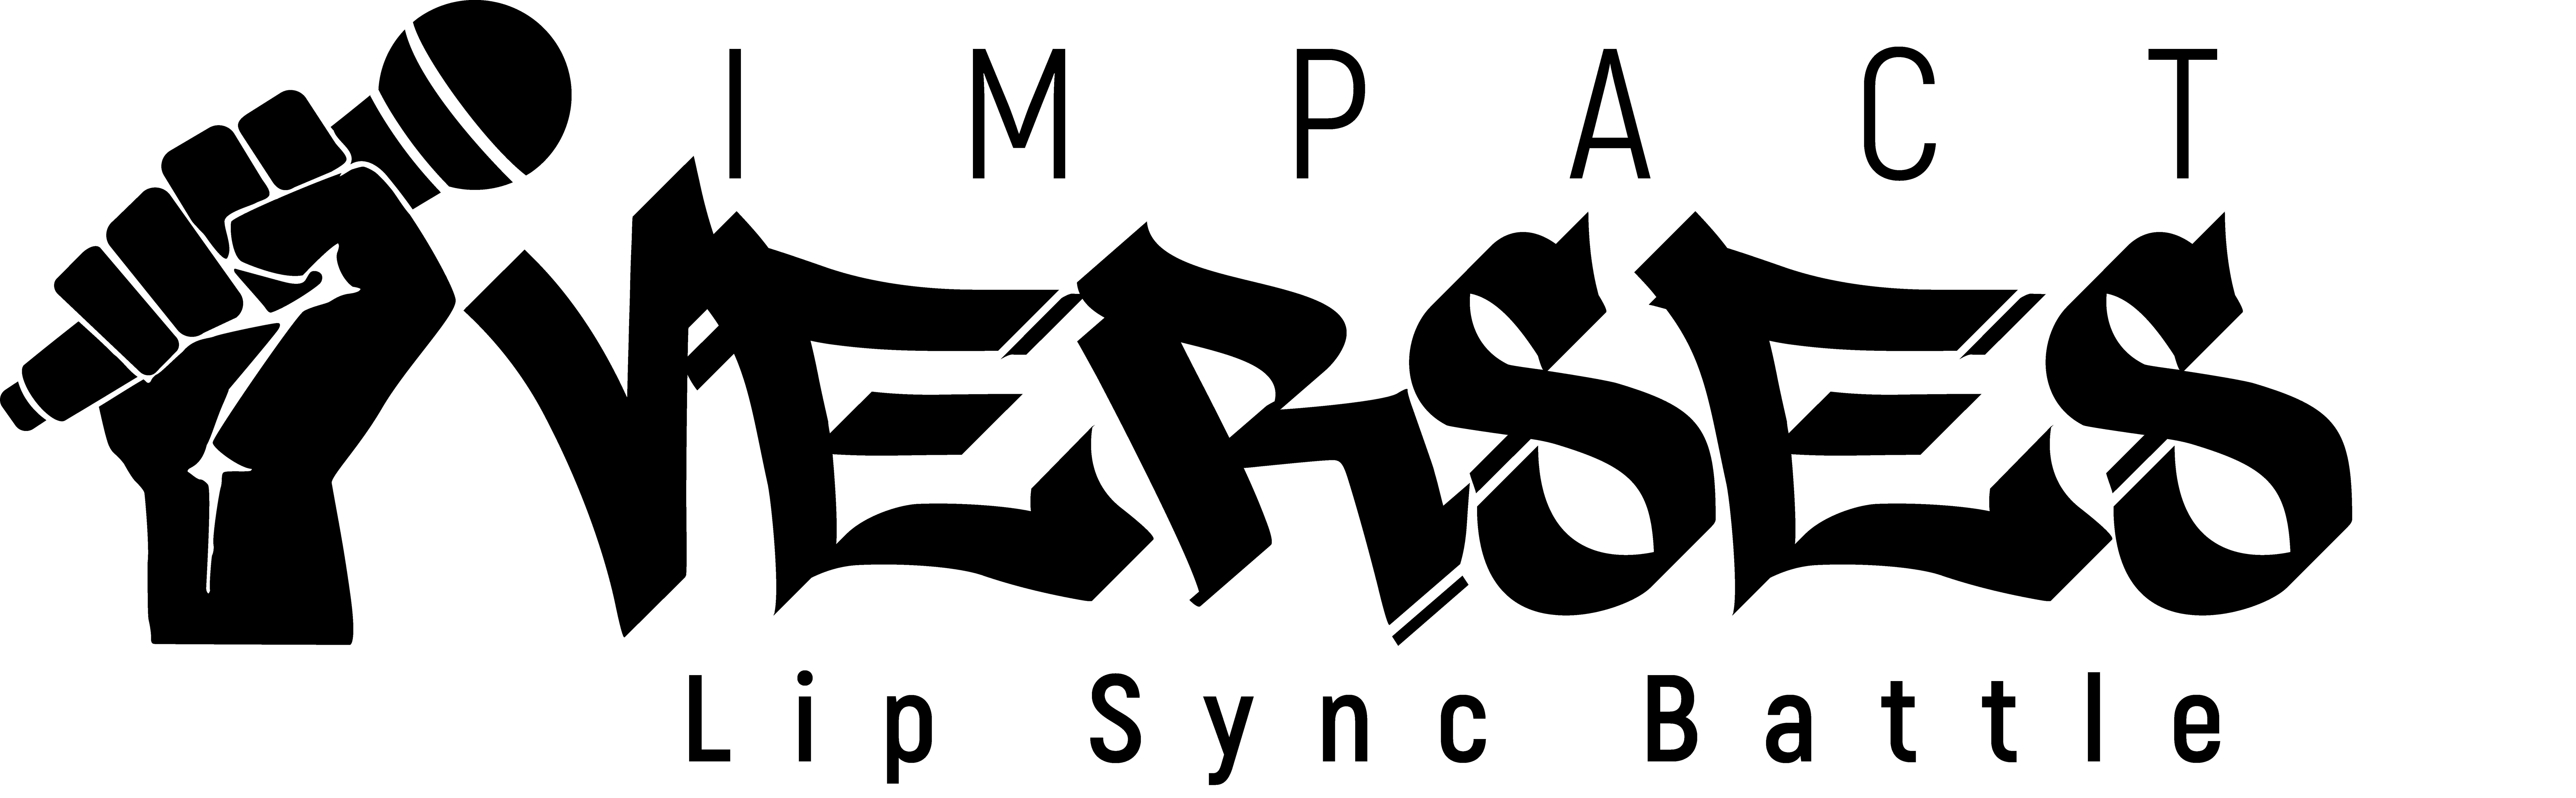 PNC Presents the Inaugural IMPACT Verses a Lip Sync Battle